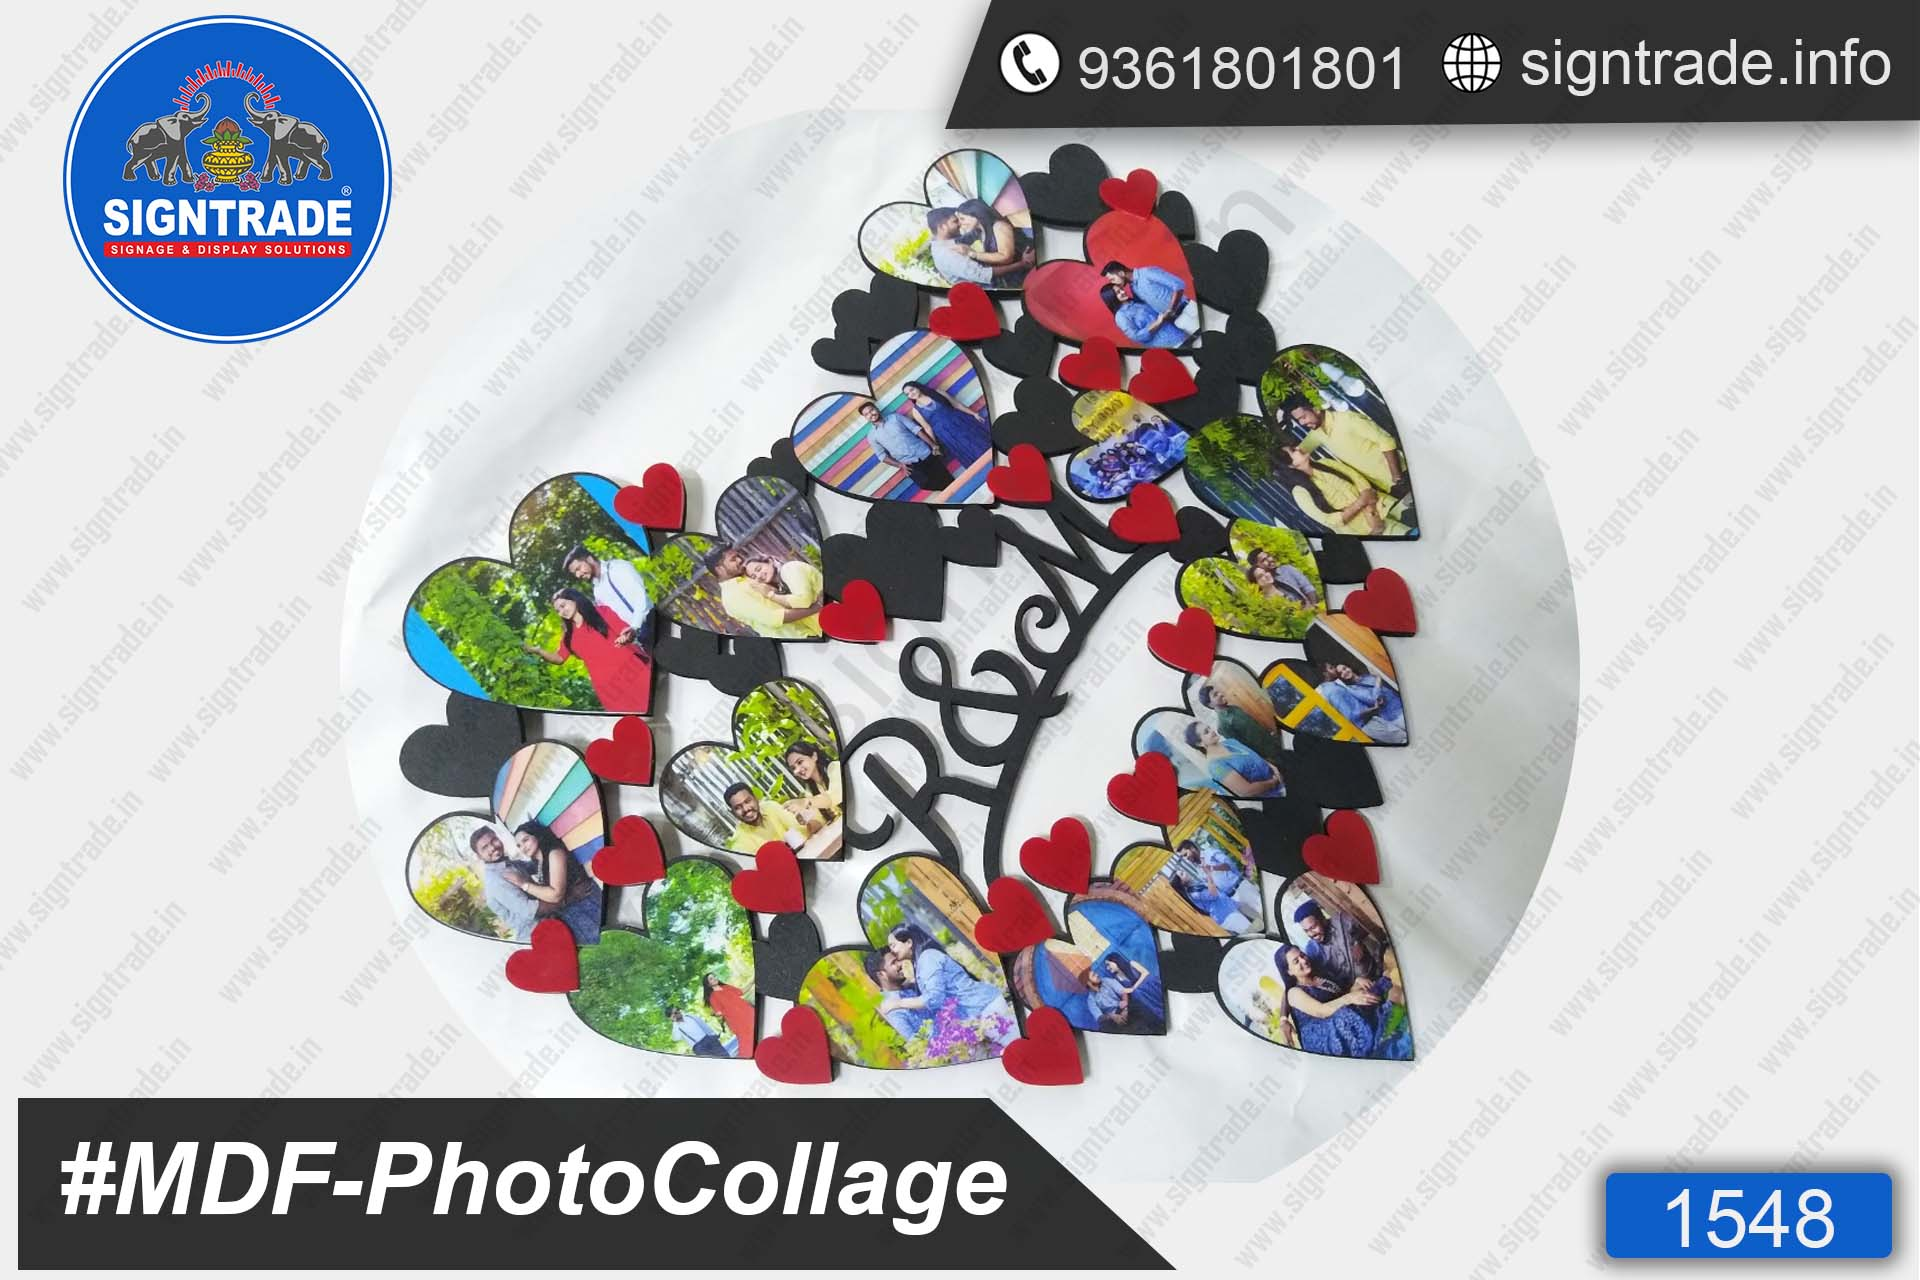 MDF Photo Collage, Photo Frame Manufacturer in Chennai